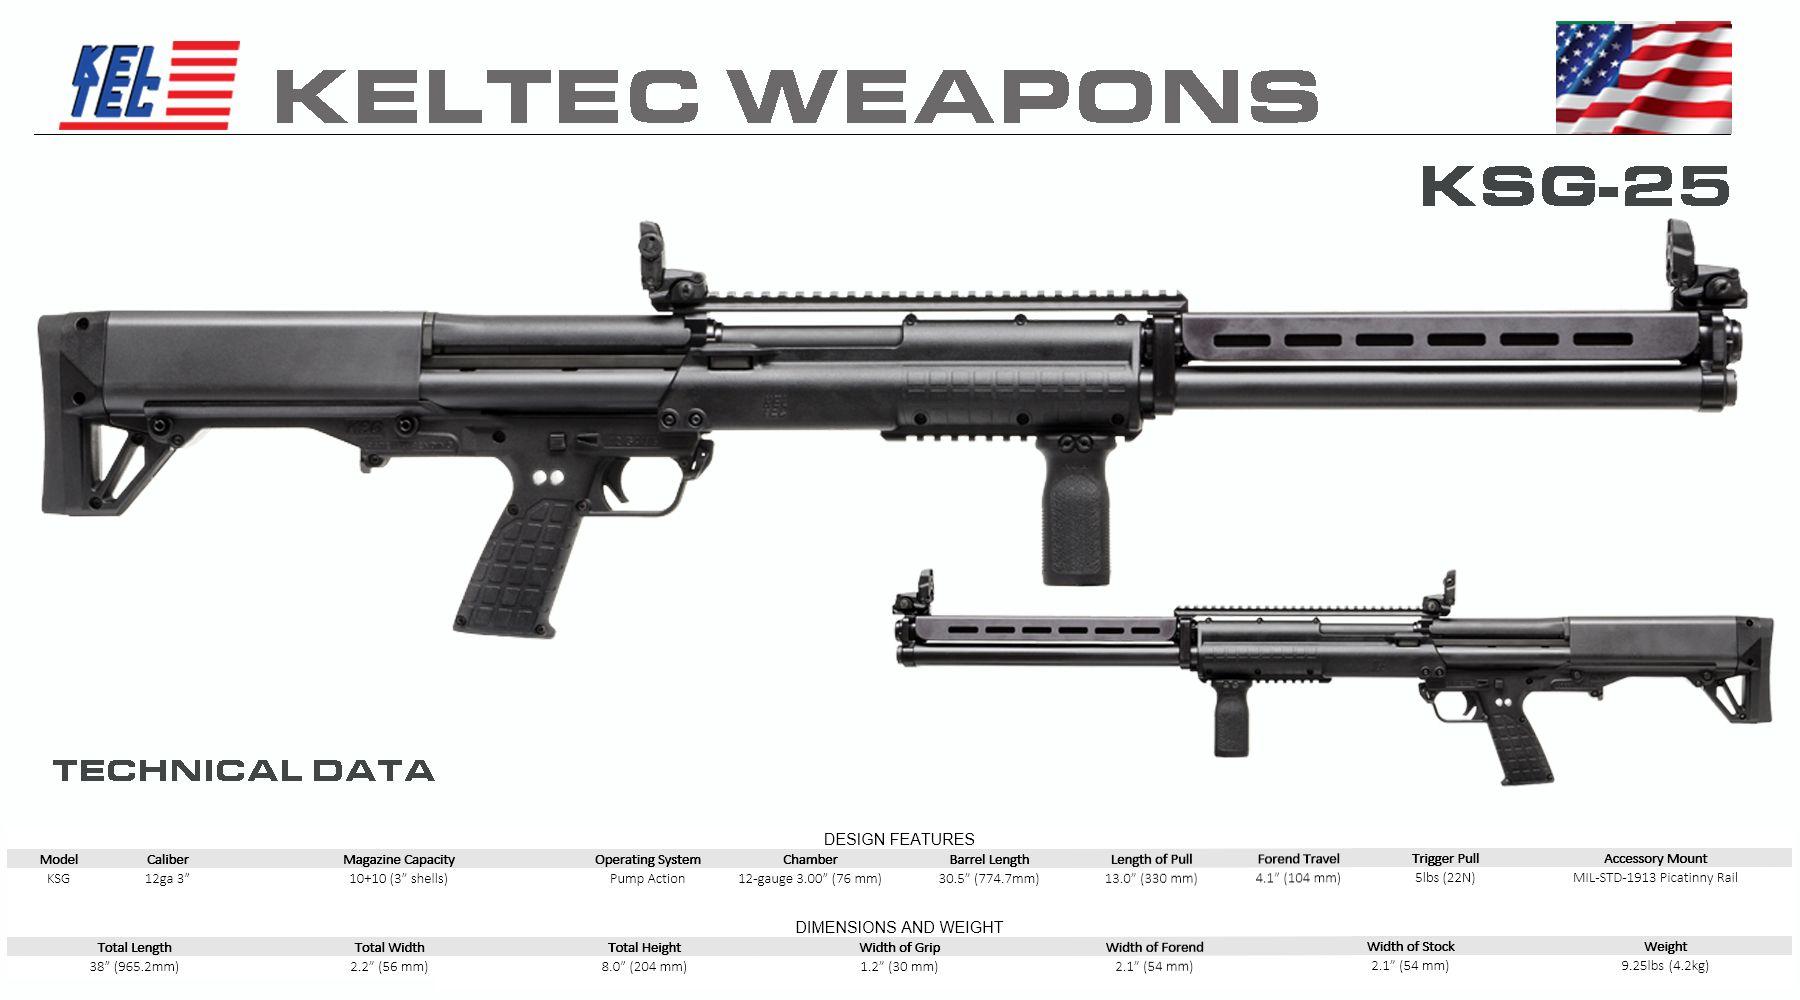 Kel-Tec - KSG-25 | 2nd | Guns, Tactical shotgun, Weapons guns